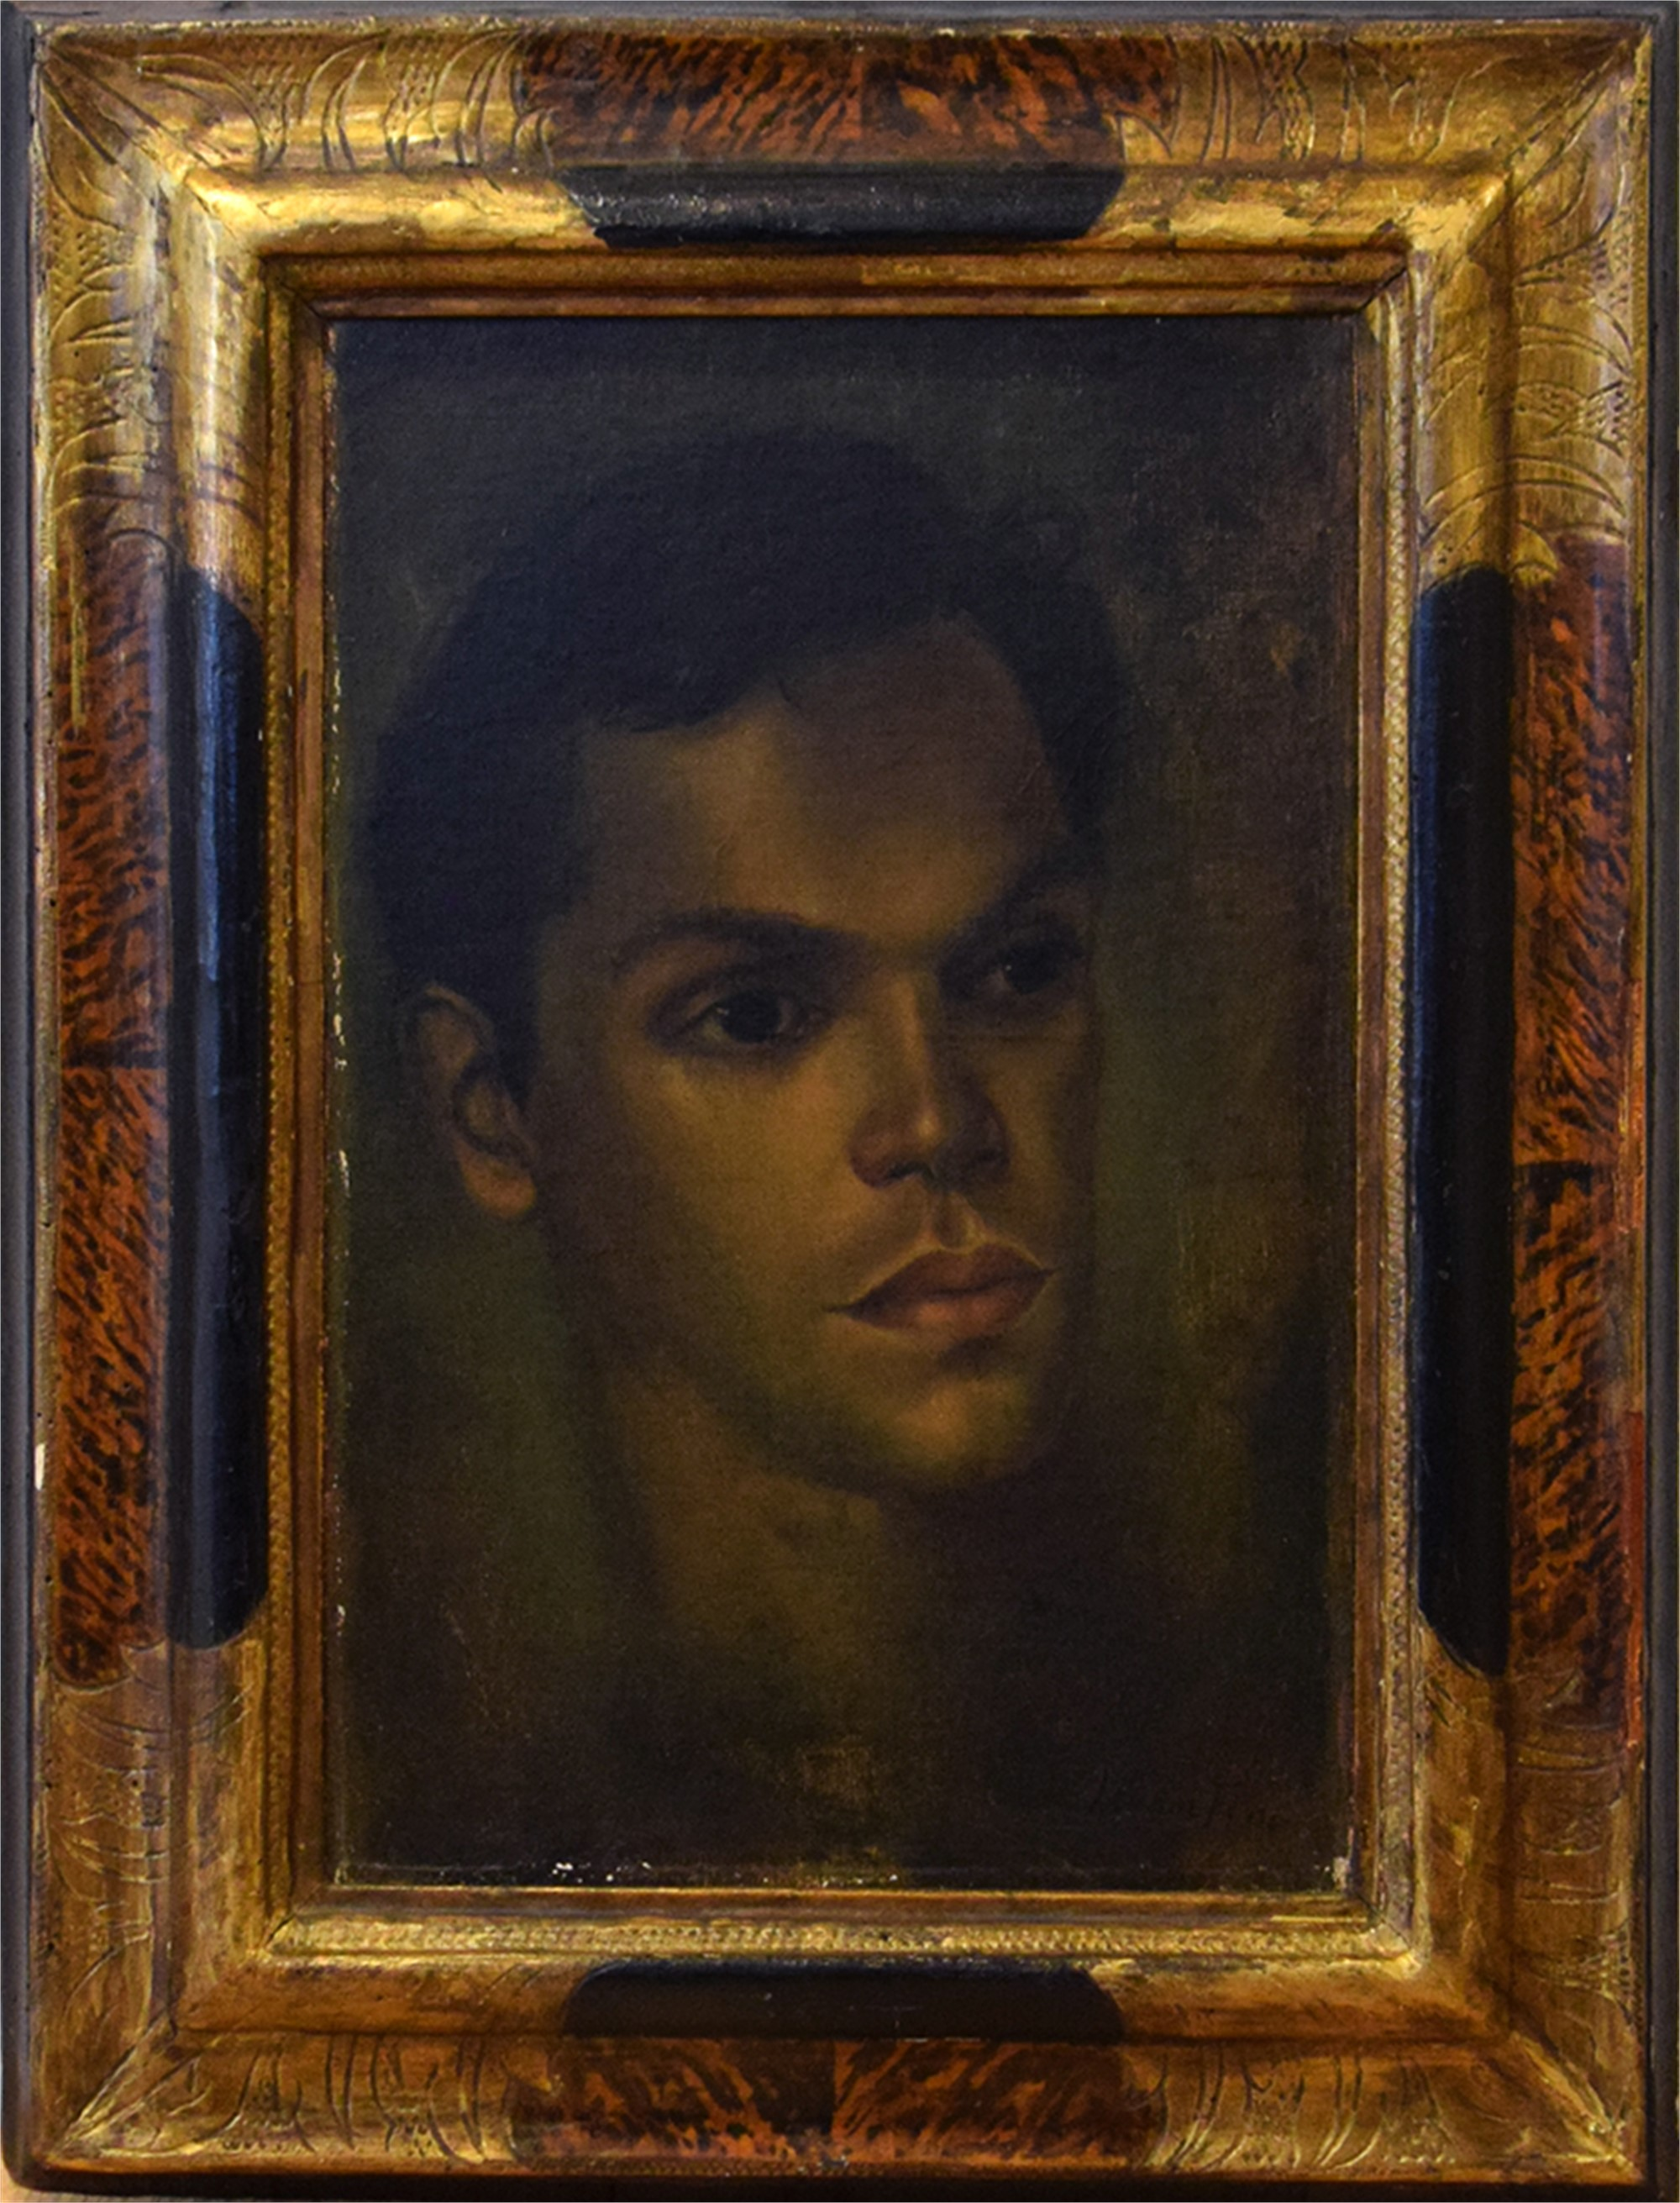 PORTRAIT OF EDULJI DINSHAW by Leonor Fini